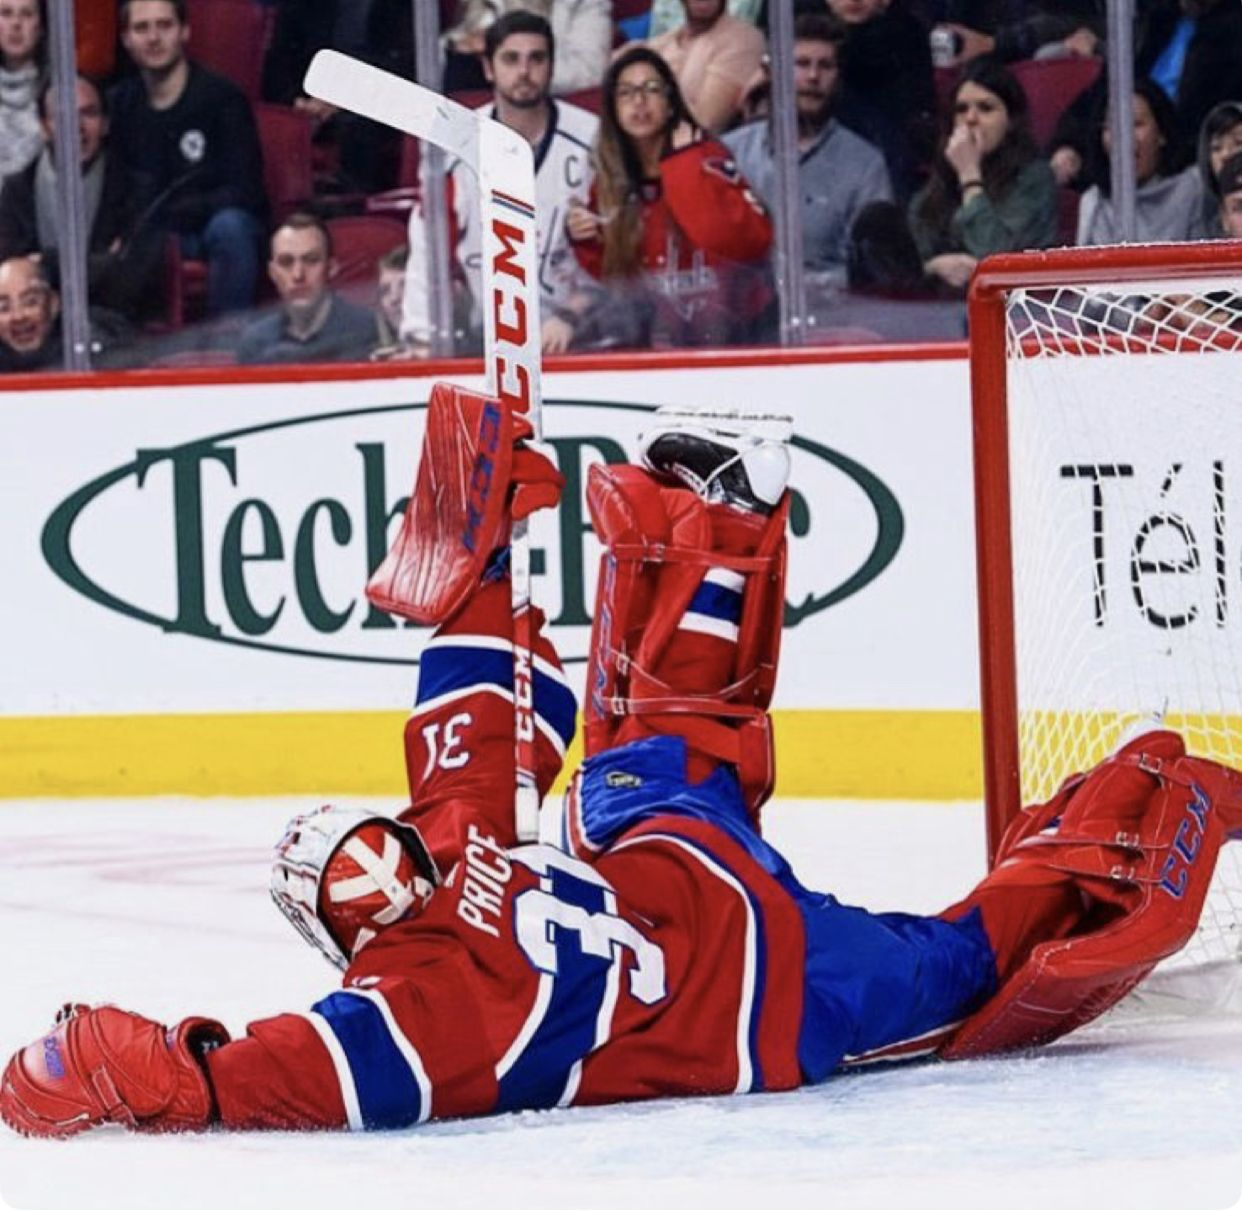 Pin by Jacksonalston on Goalie Montreal canadiens hockey